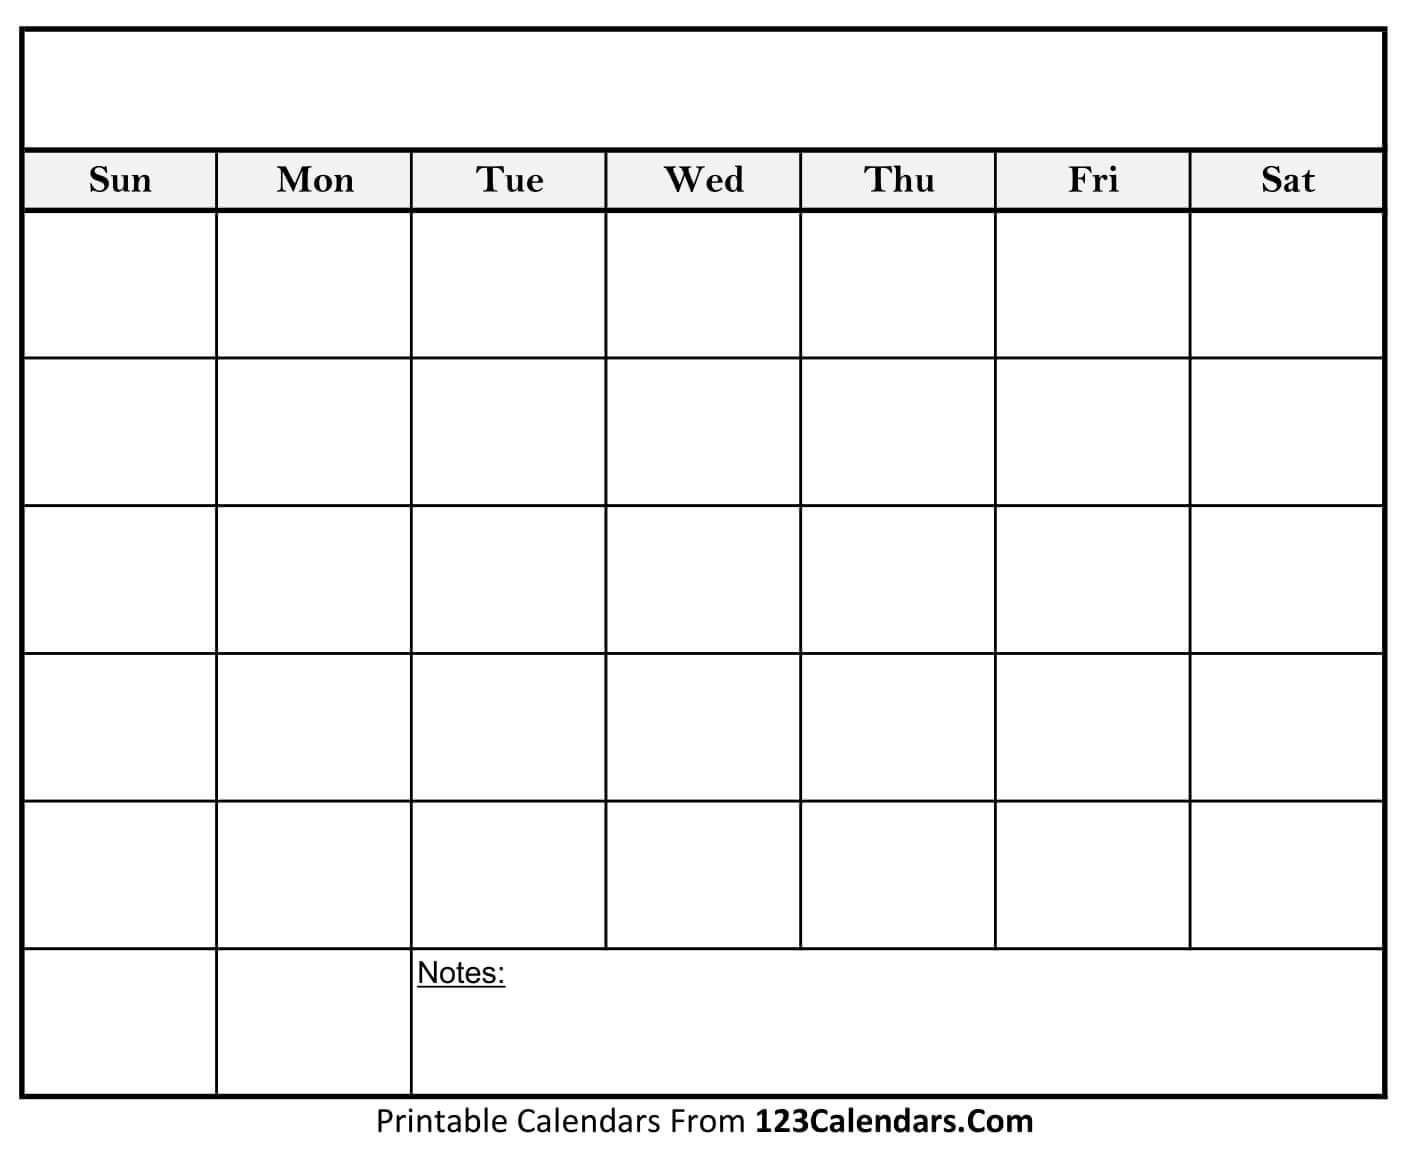 Free Printable Blank Calendar | 123Calendars Calendar Blank To Print